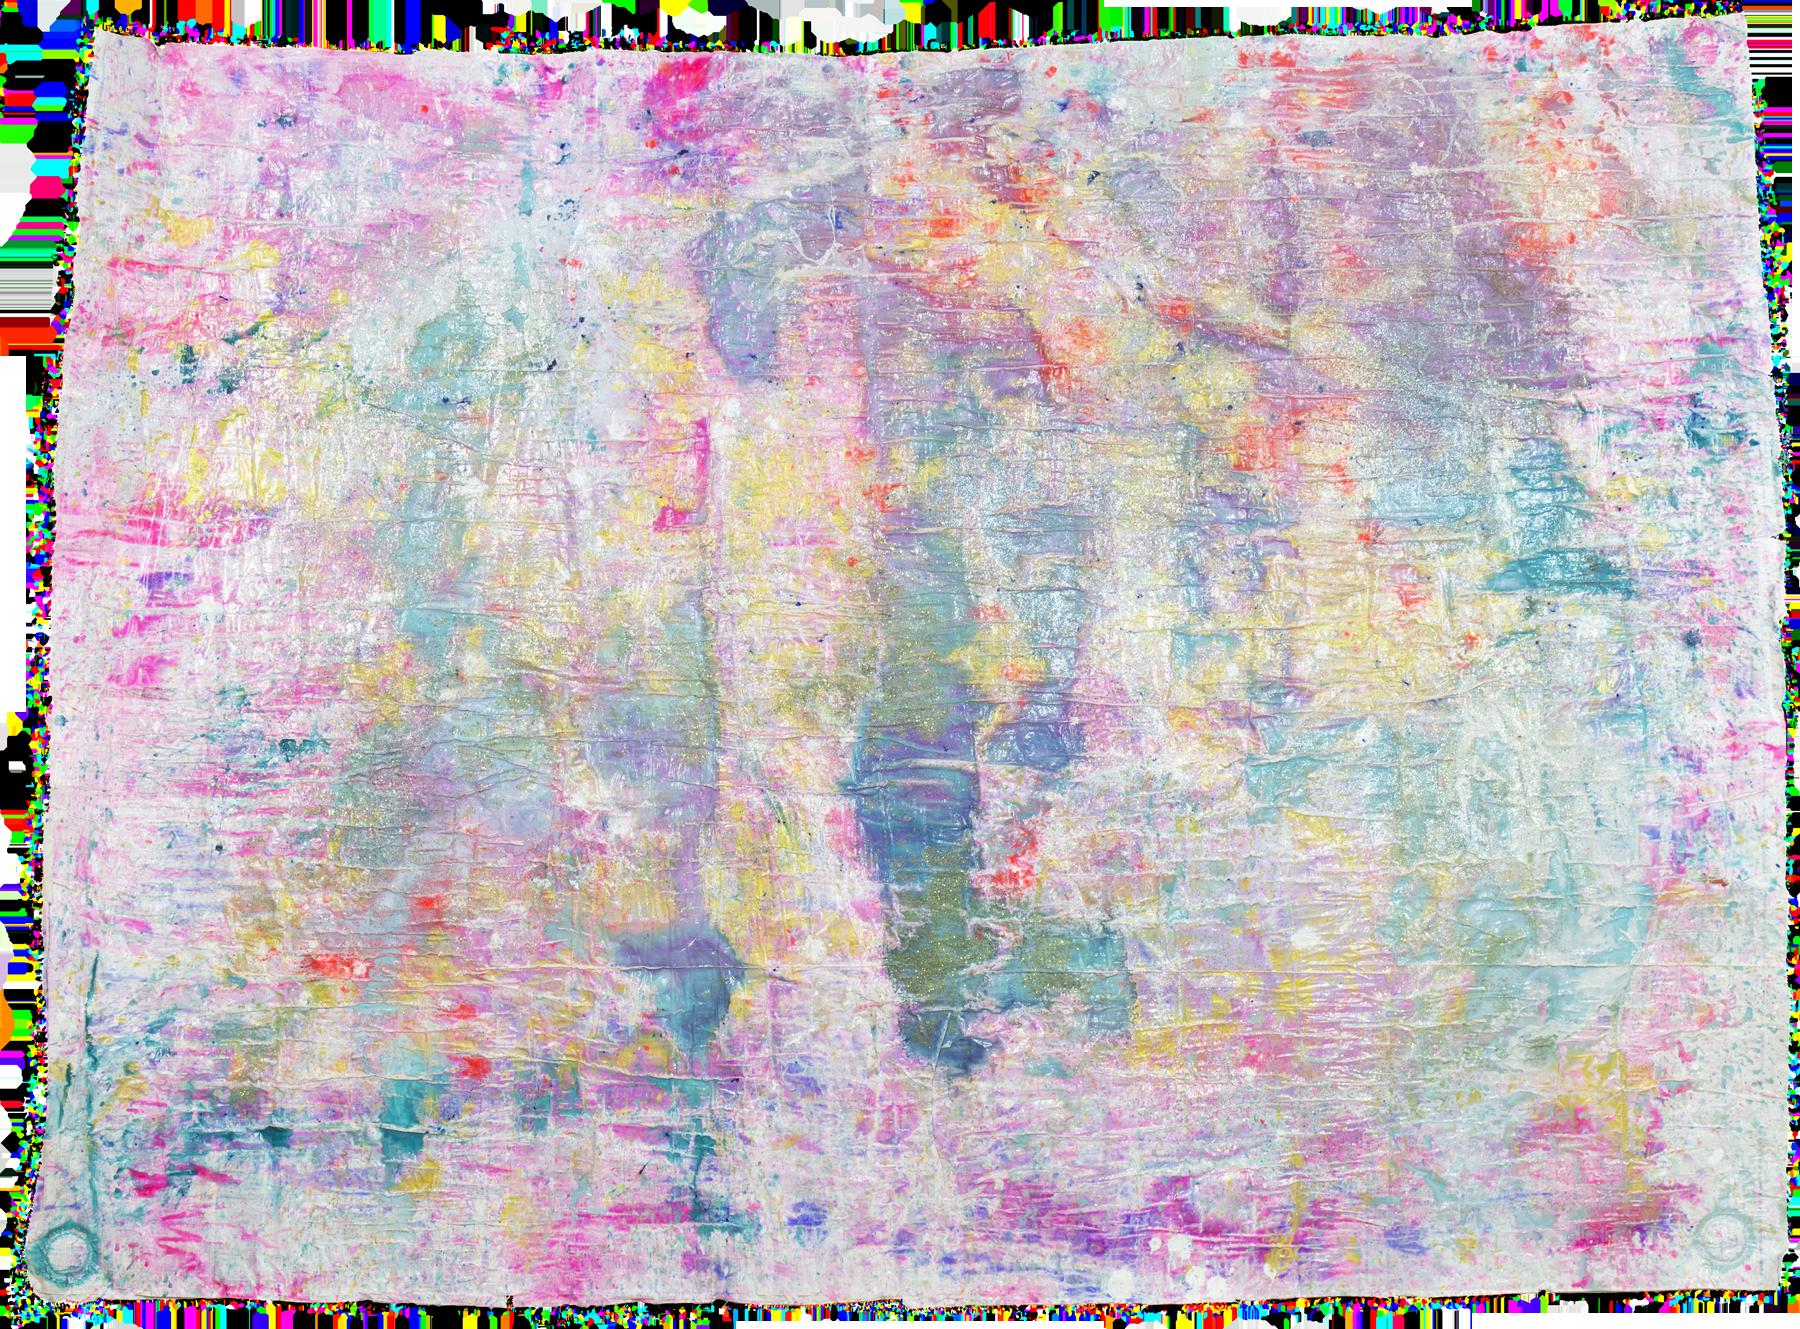 'Sparkling skies NO. 10', 135 x 185 cm, acrylic paint on handmade paper-base, Kerstin Pressler, www.kerstinpressler.com